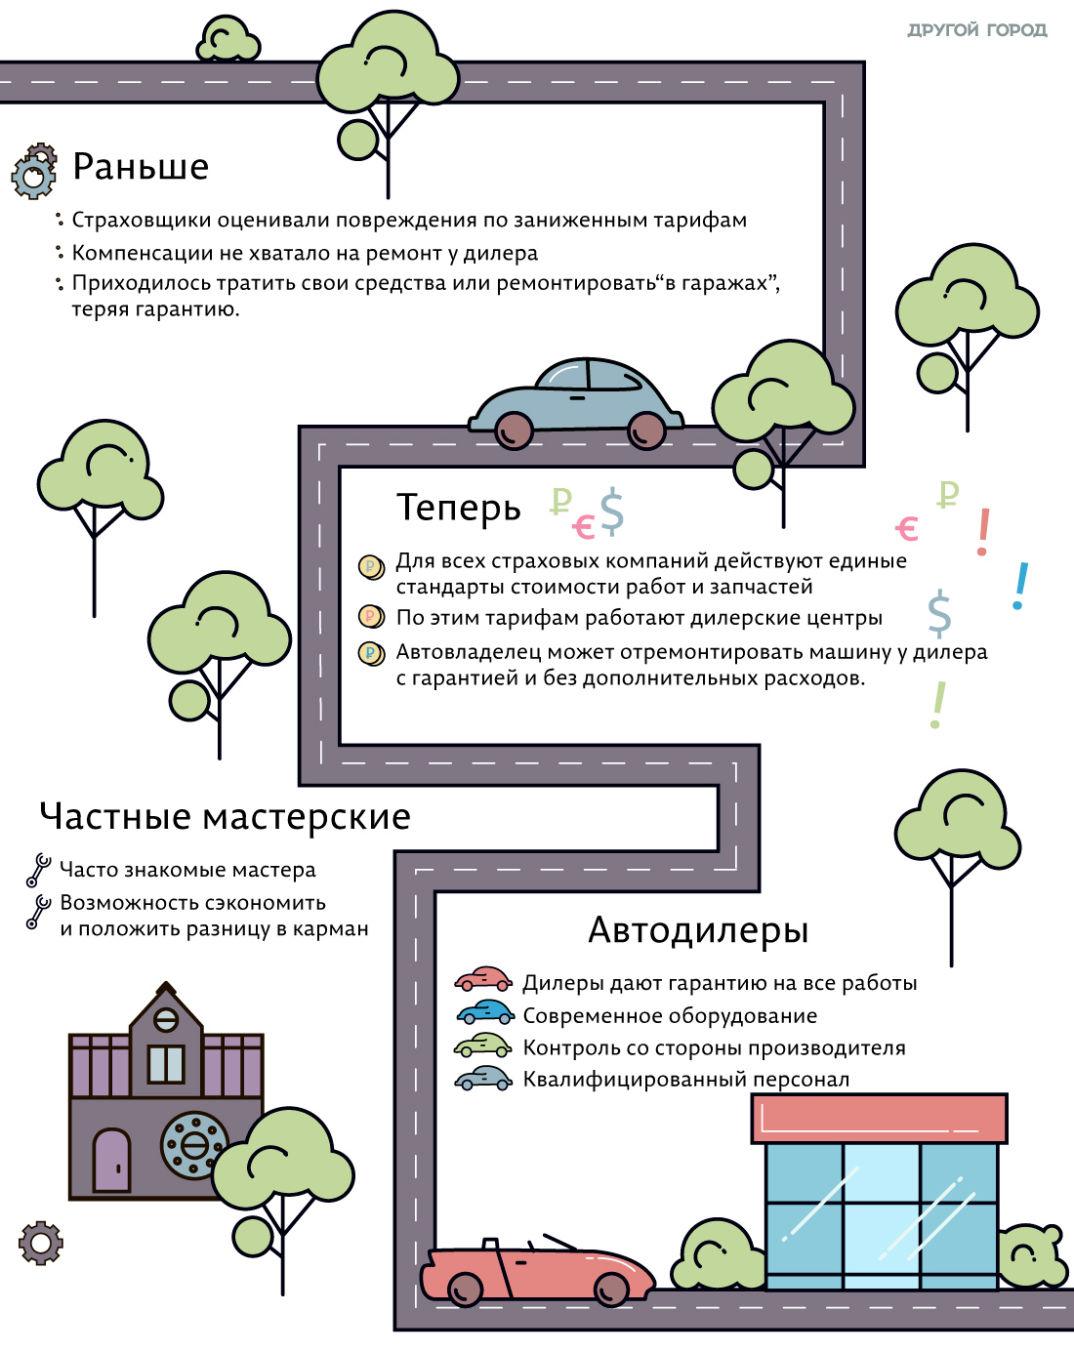 infogr_kia6